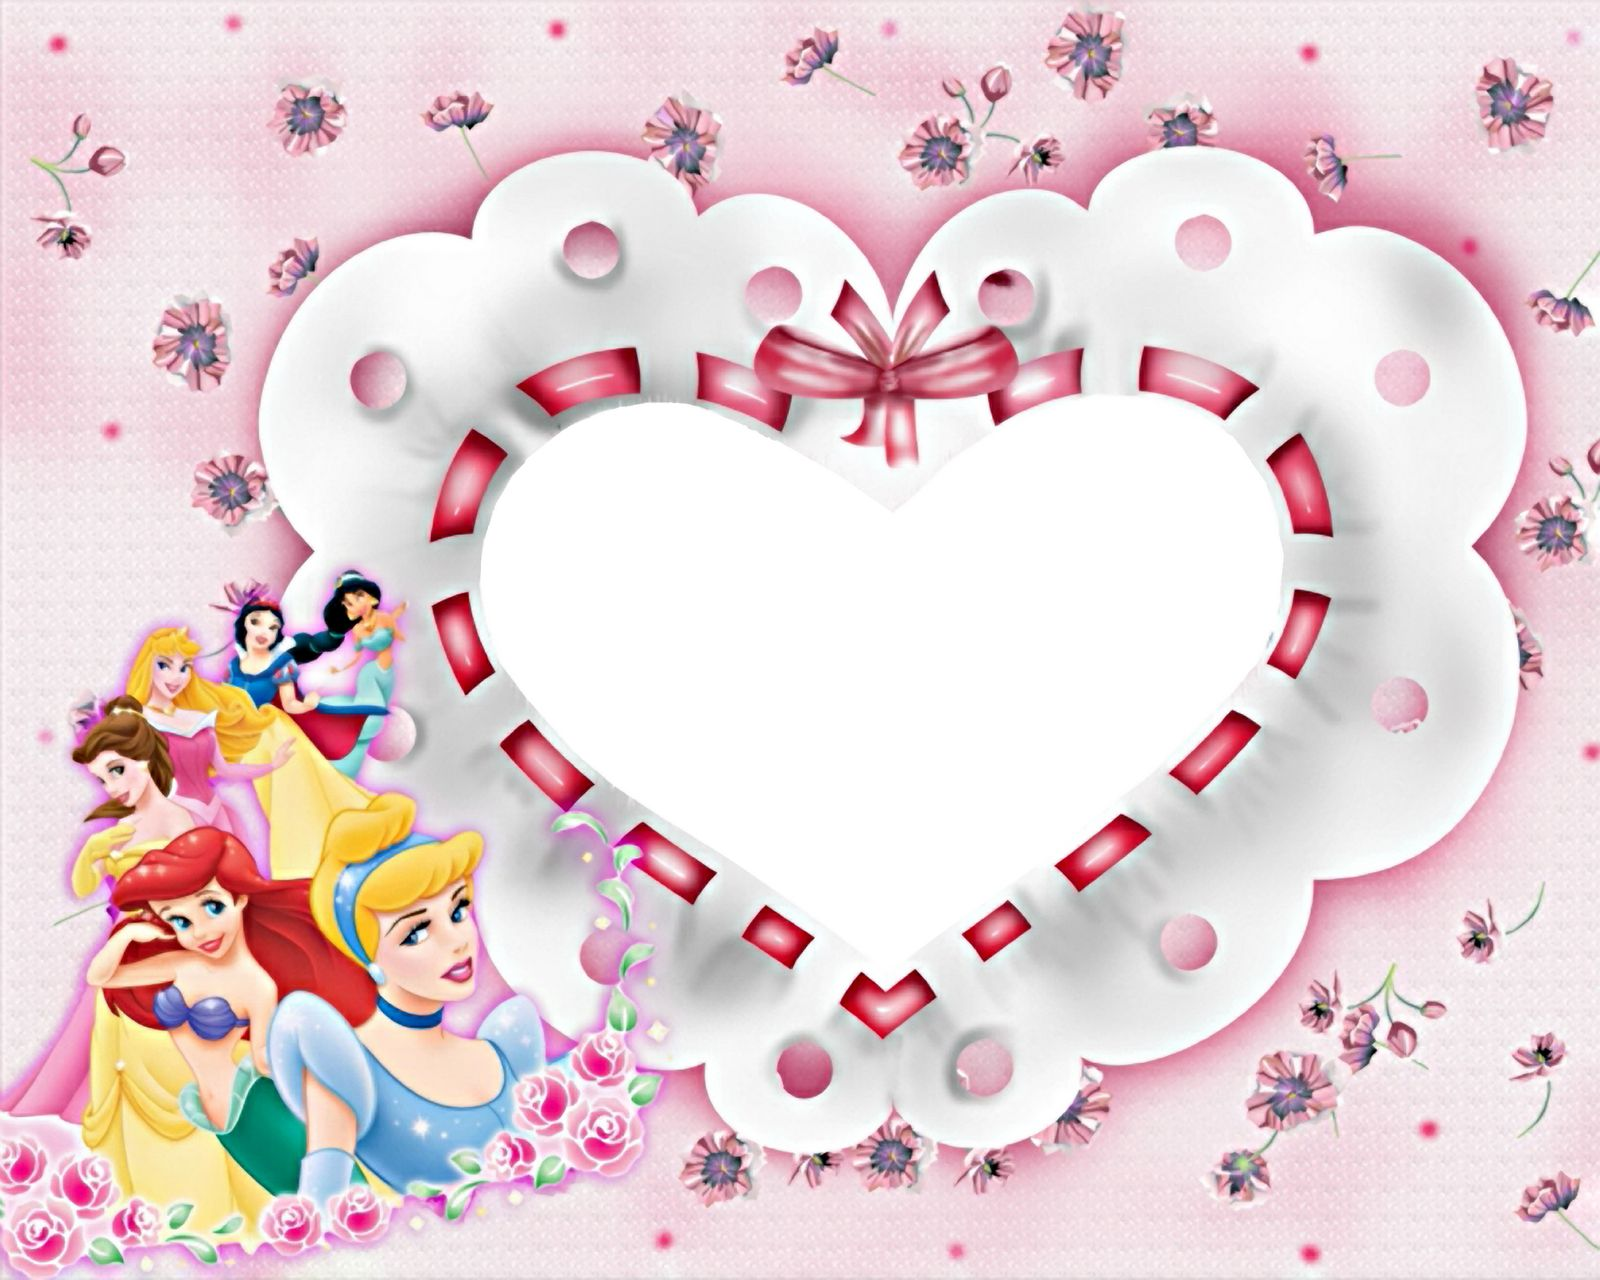 Fiestas Infantiles, Princesas de Disney, Princecitas